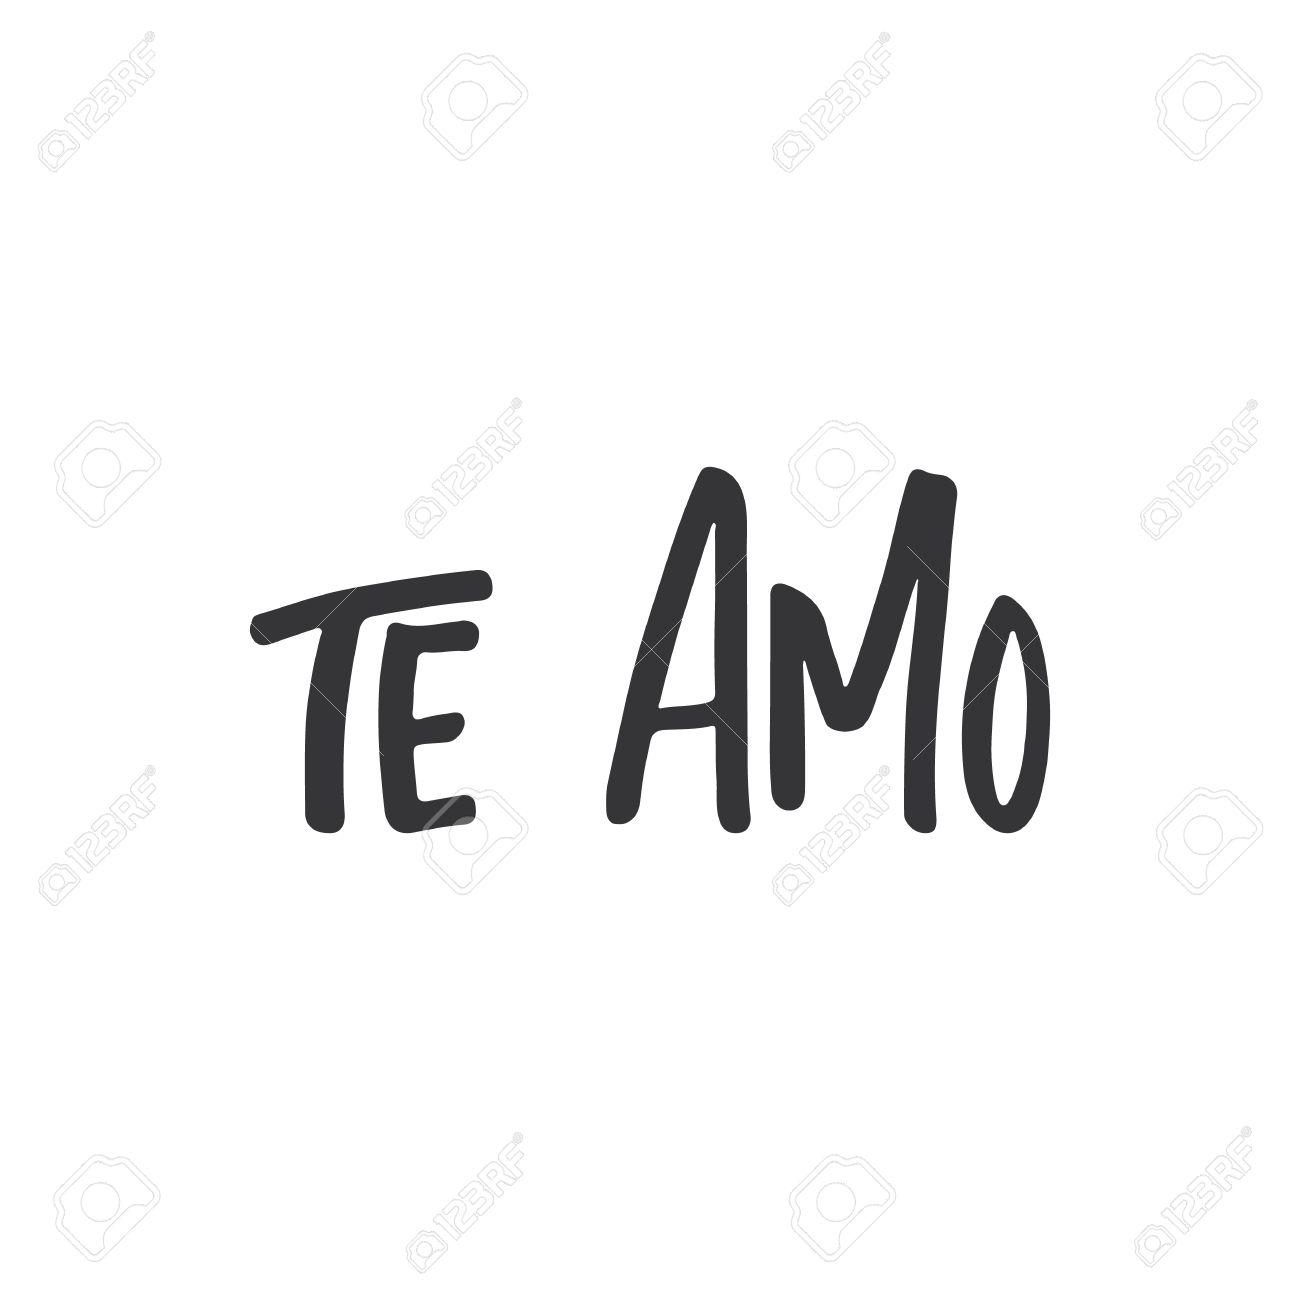 te amo i love you lettering calligraphy phrase in spanish